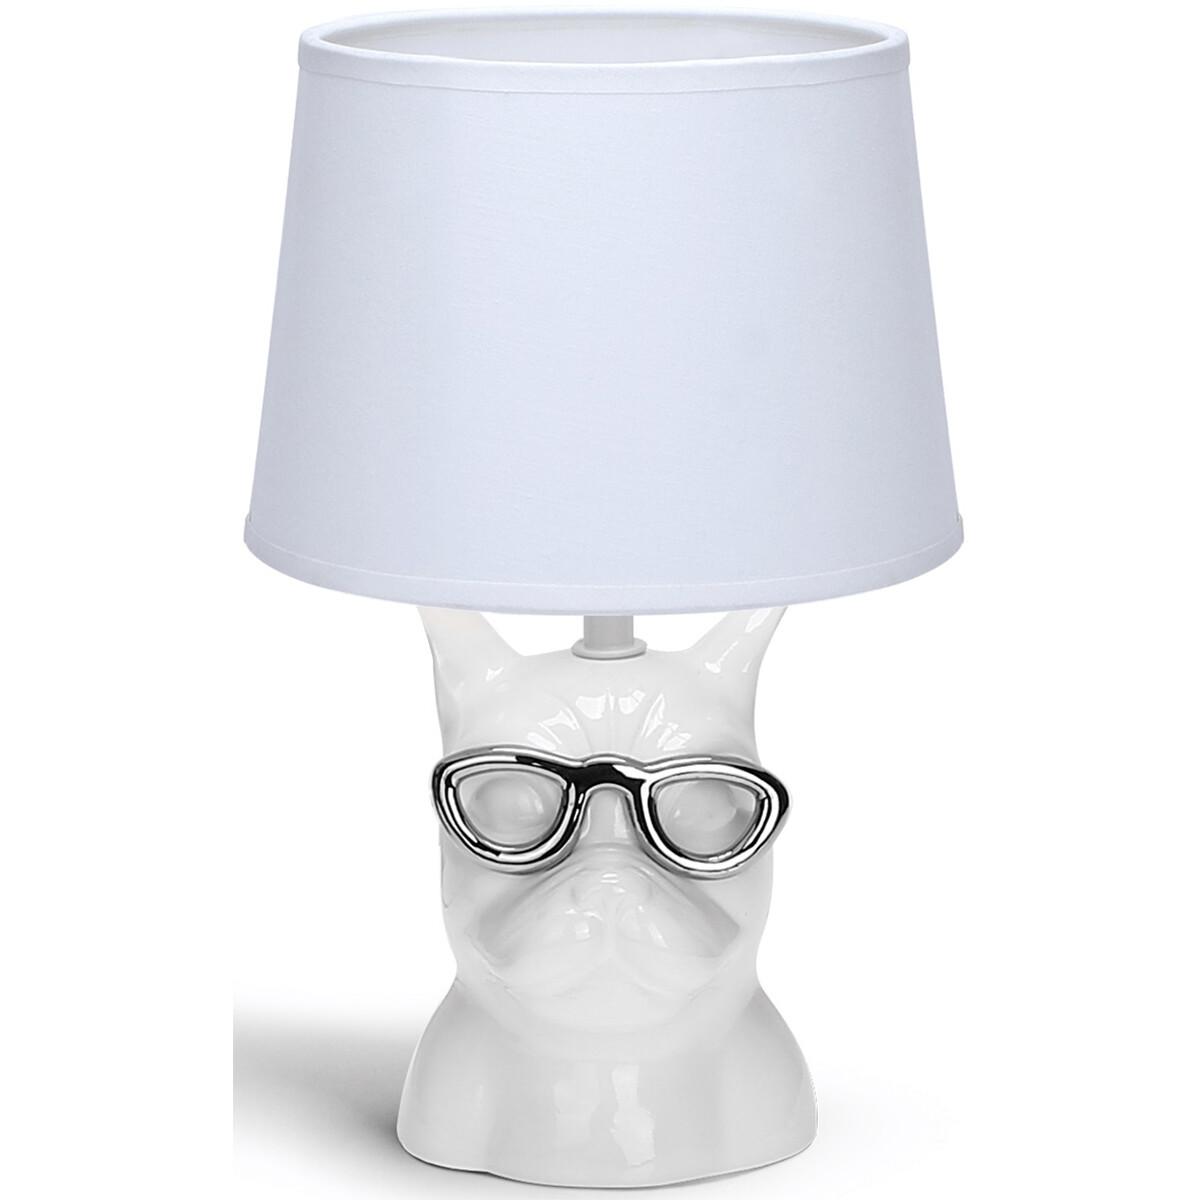 LED Tafellamp - Tafelverlichting - Aigi Xinus - E14 Fitting - Rond - Mat Wit - Keramiek